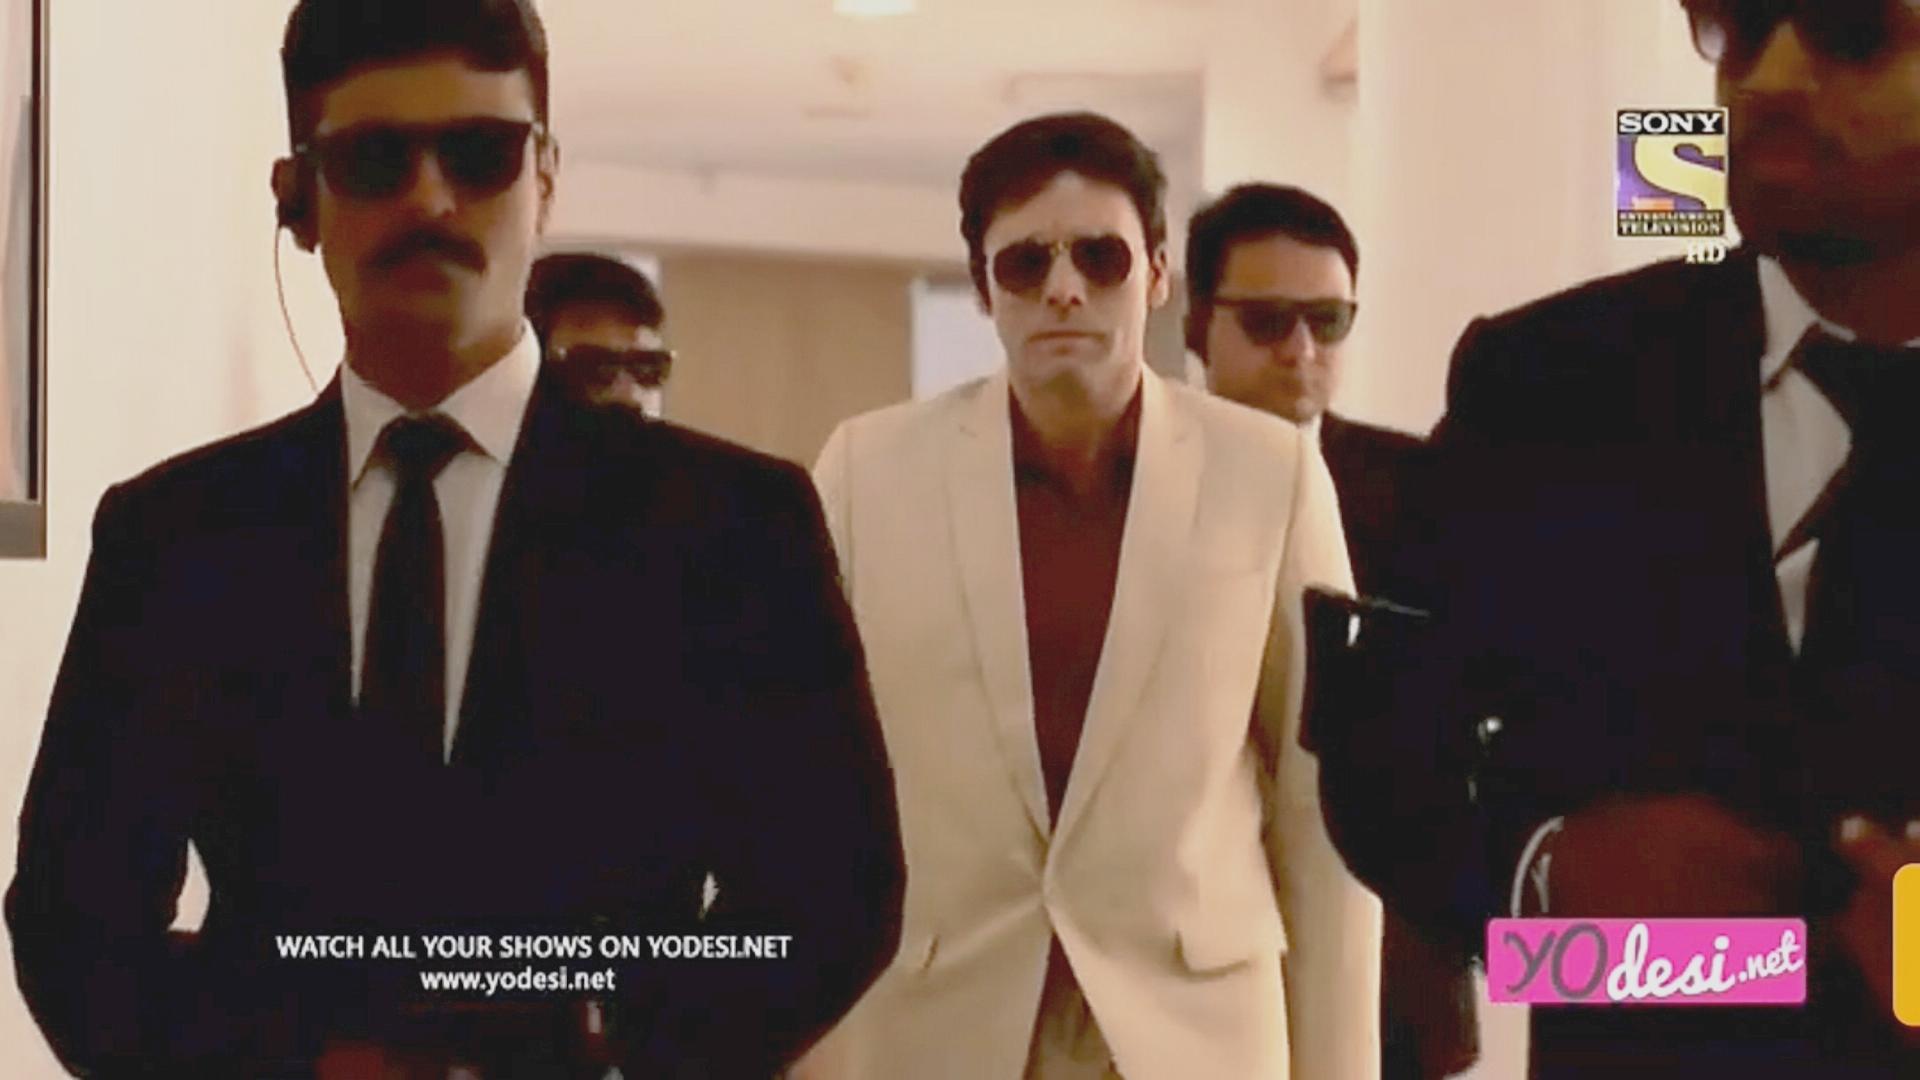 Top Five Yo Desi net Sony Tv Download - Circus